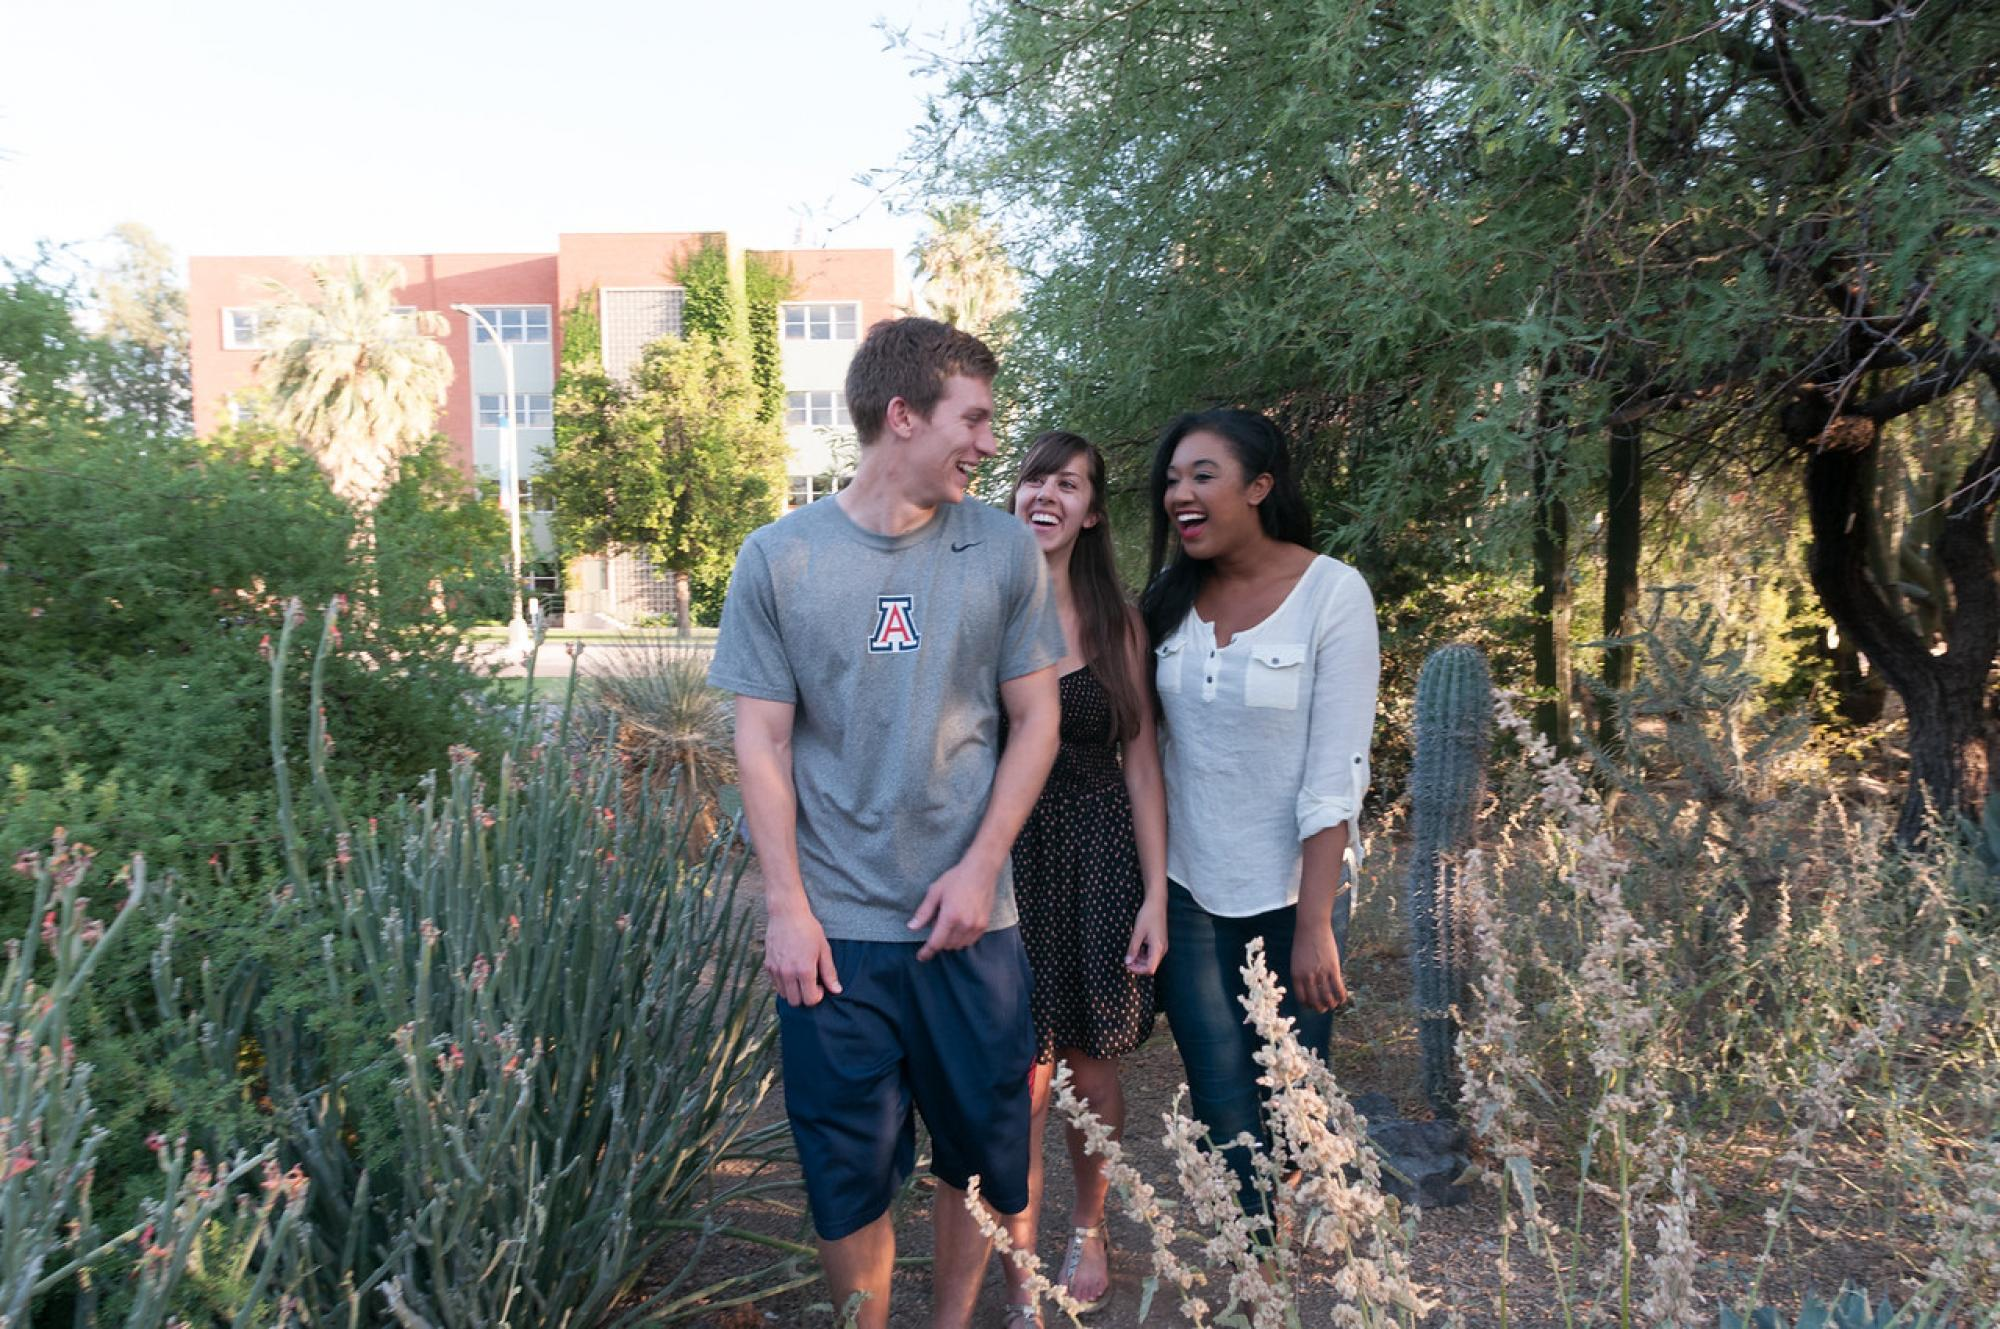 three smiling students walk through cactus garden, University of Arizona, Tucson